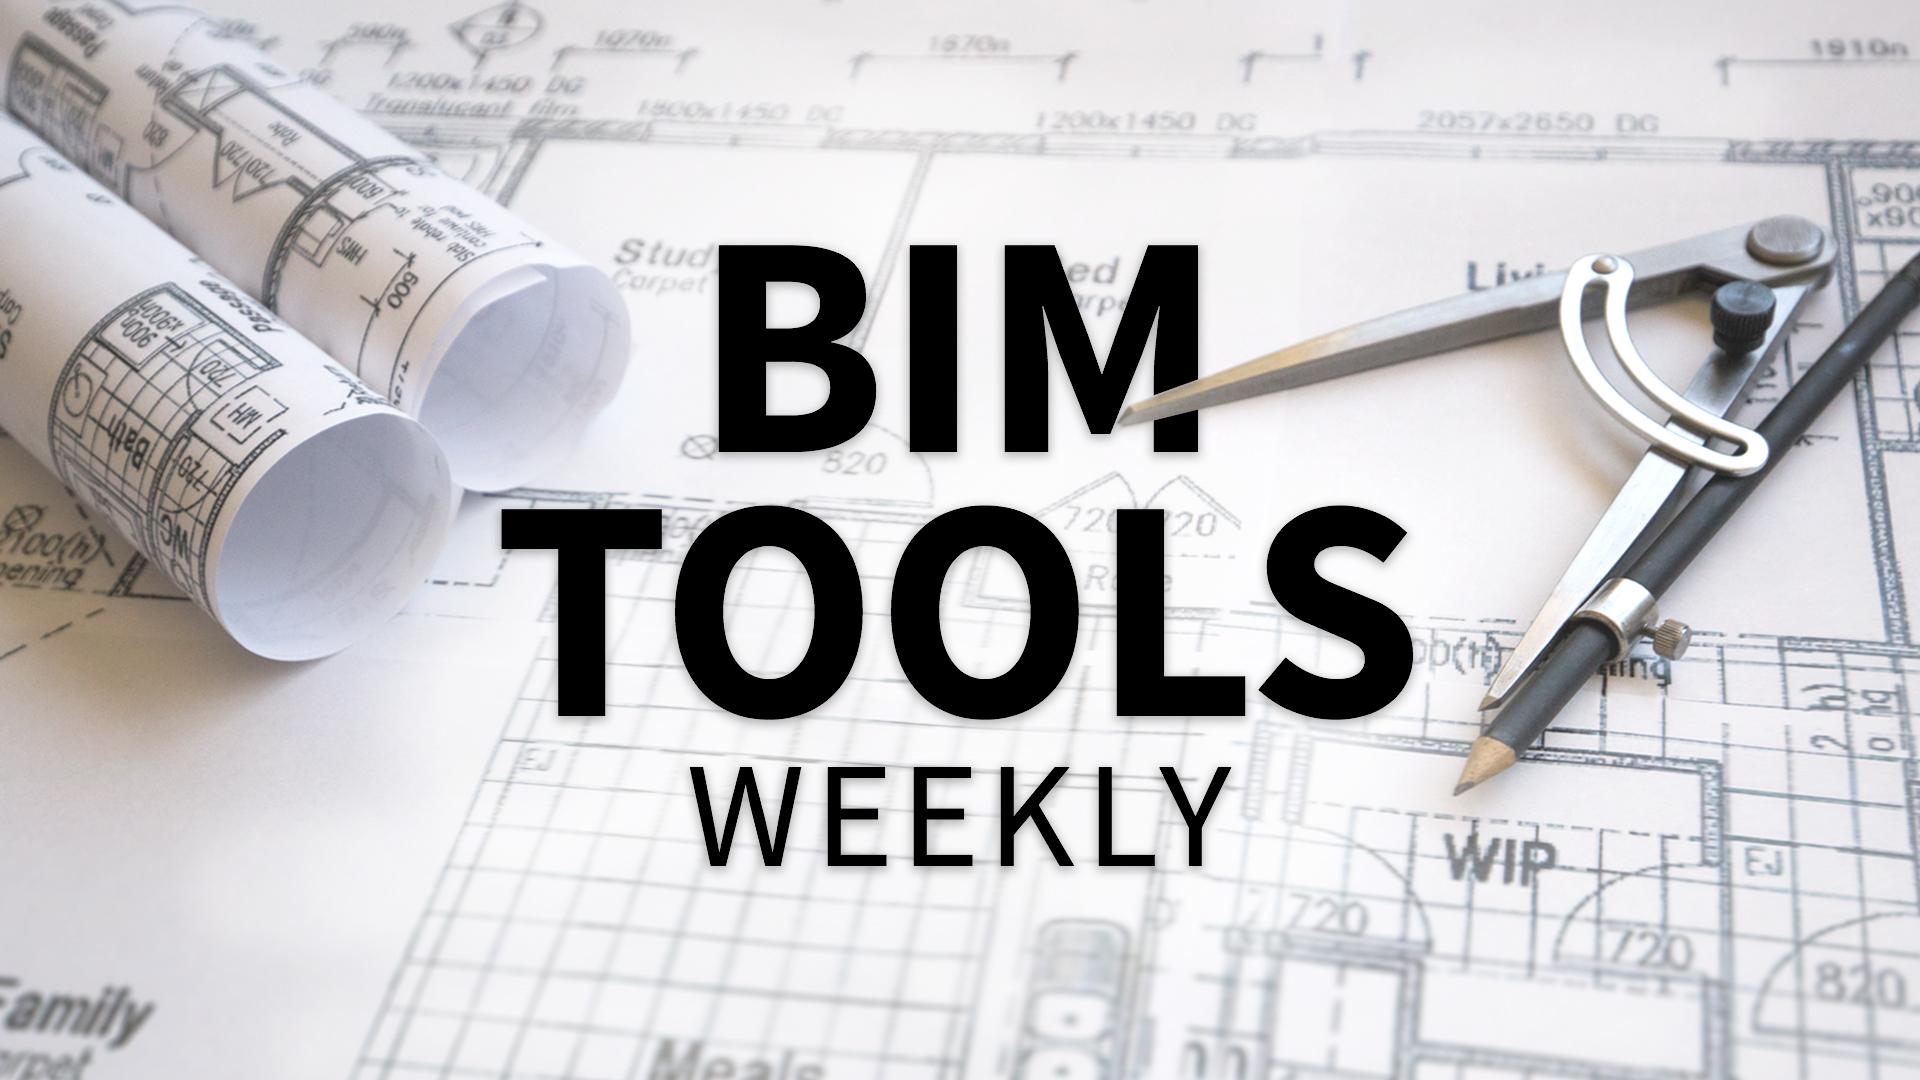 : BIM Tools Weekly